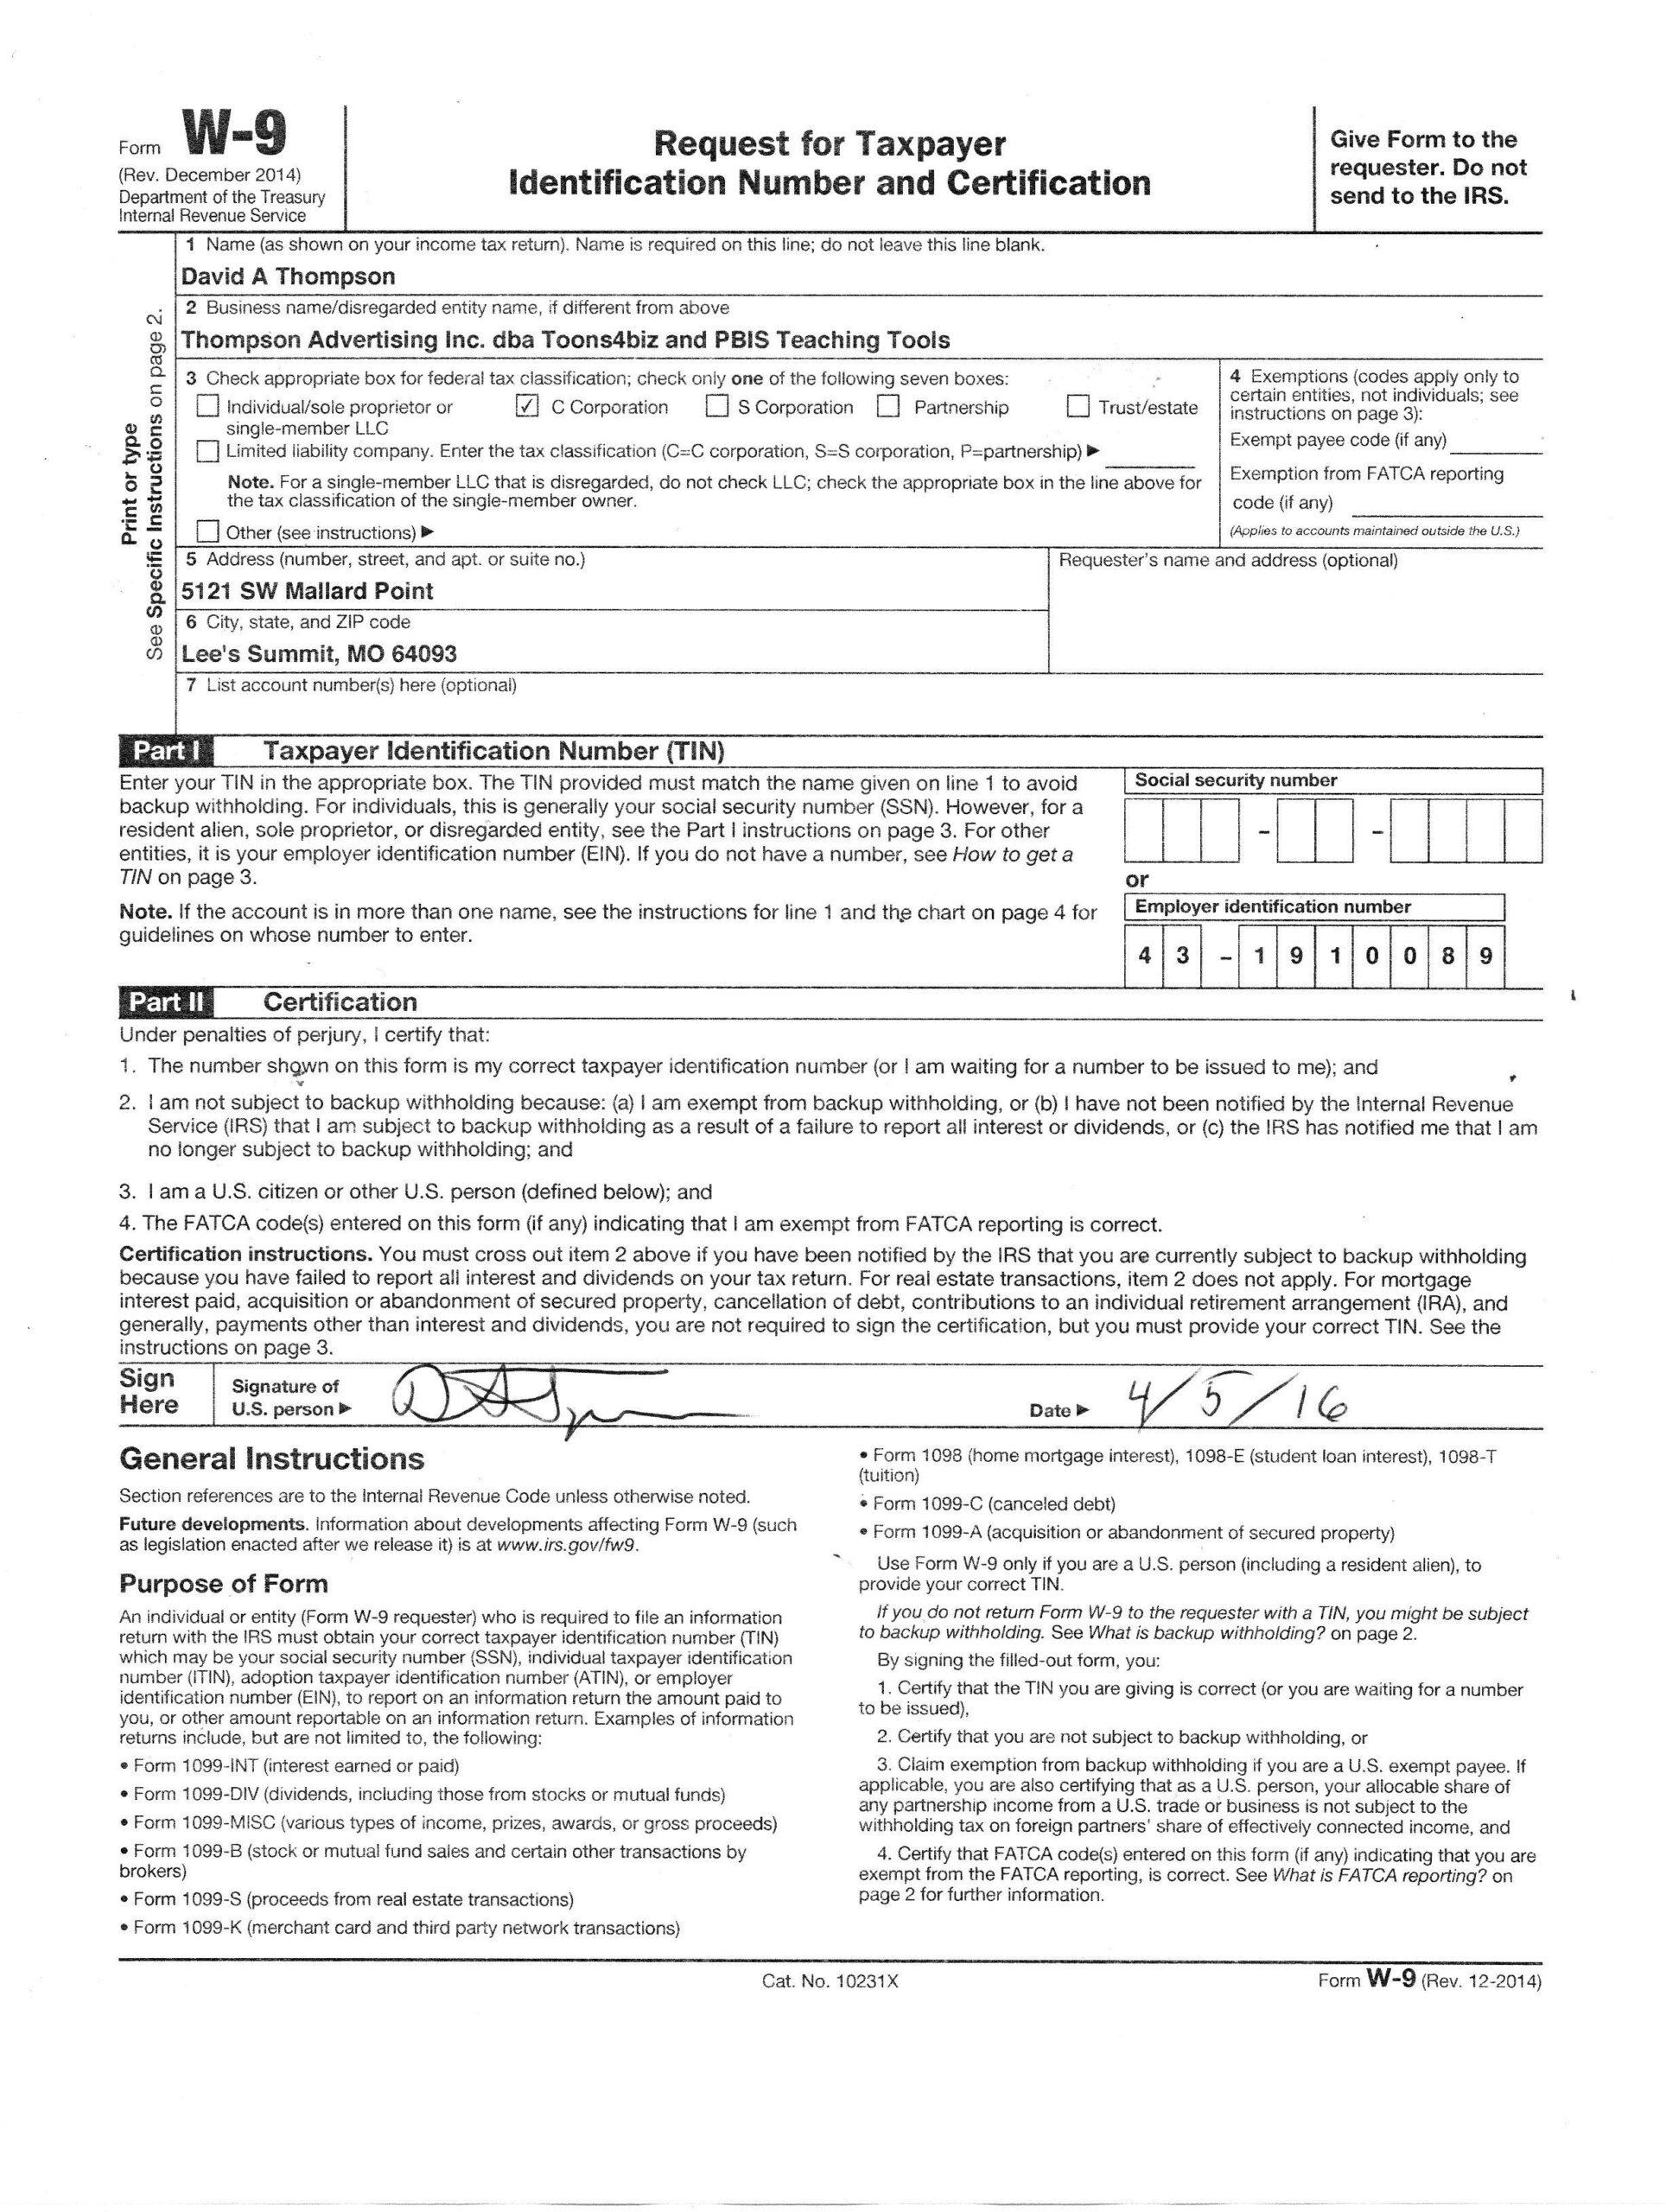 W9 Form 2021 Printable Form